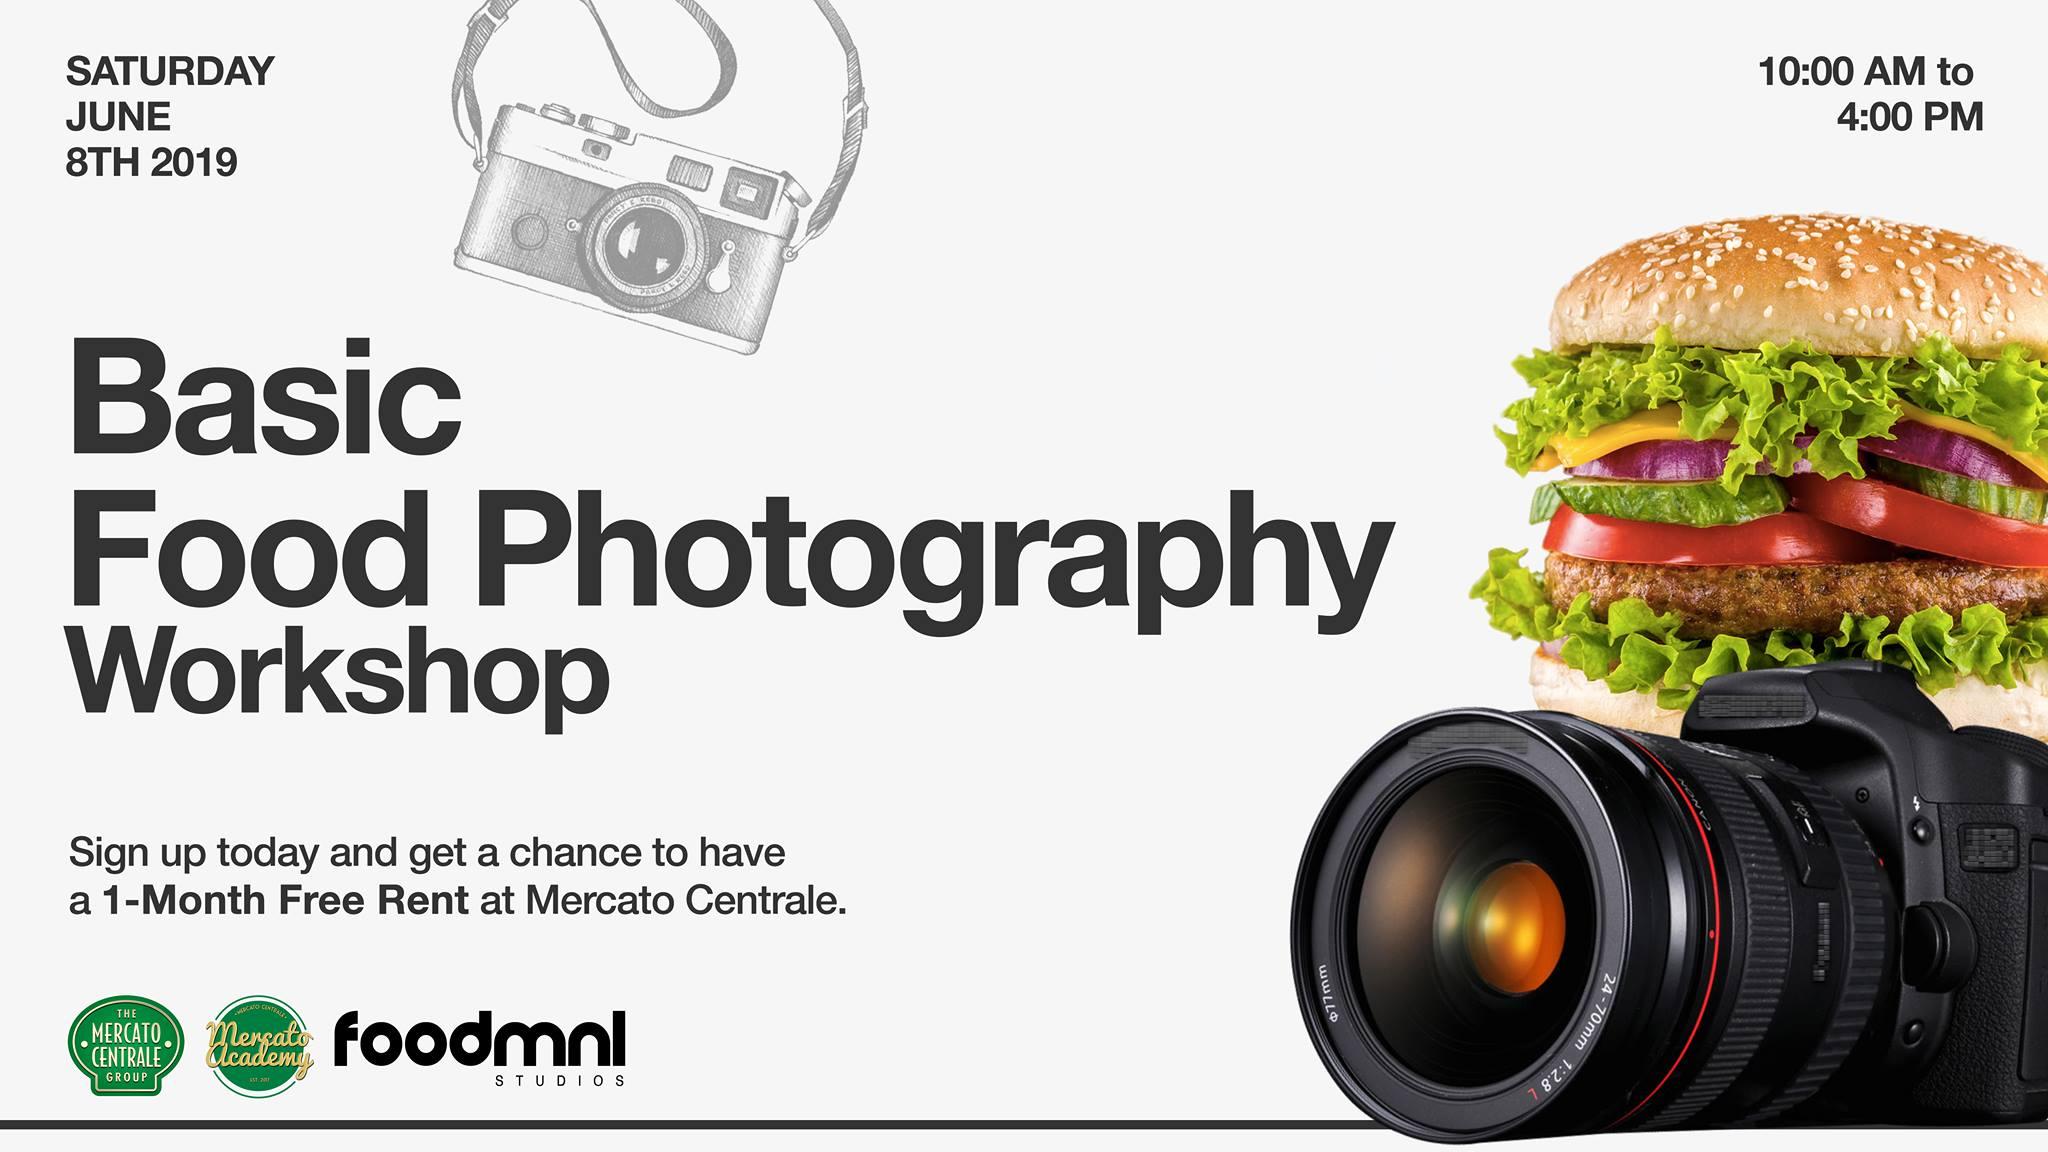 BASIC FOOD PHOTOGRAPHY WORKSHOP